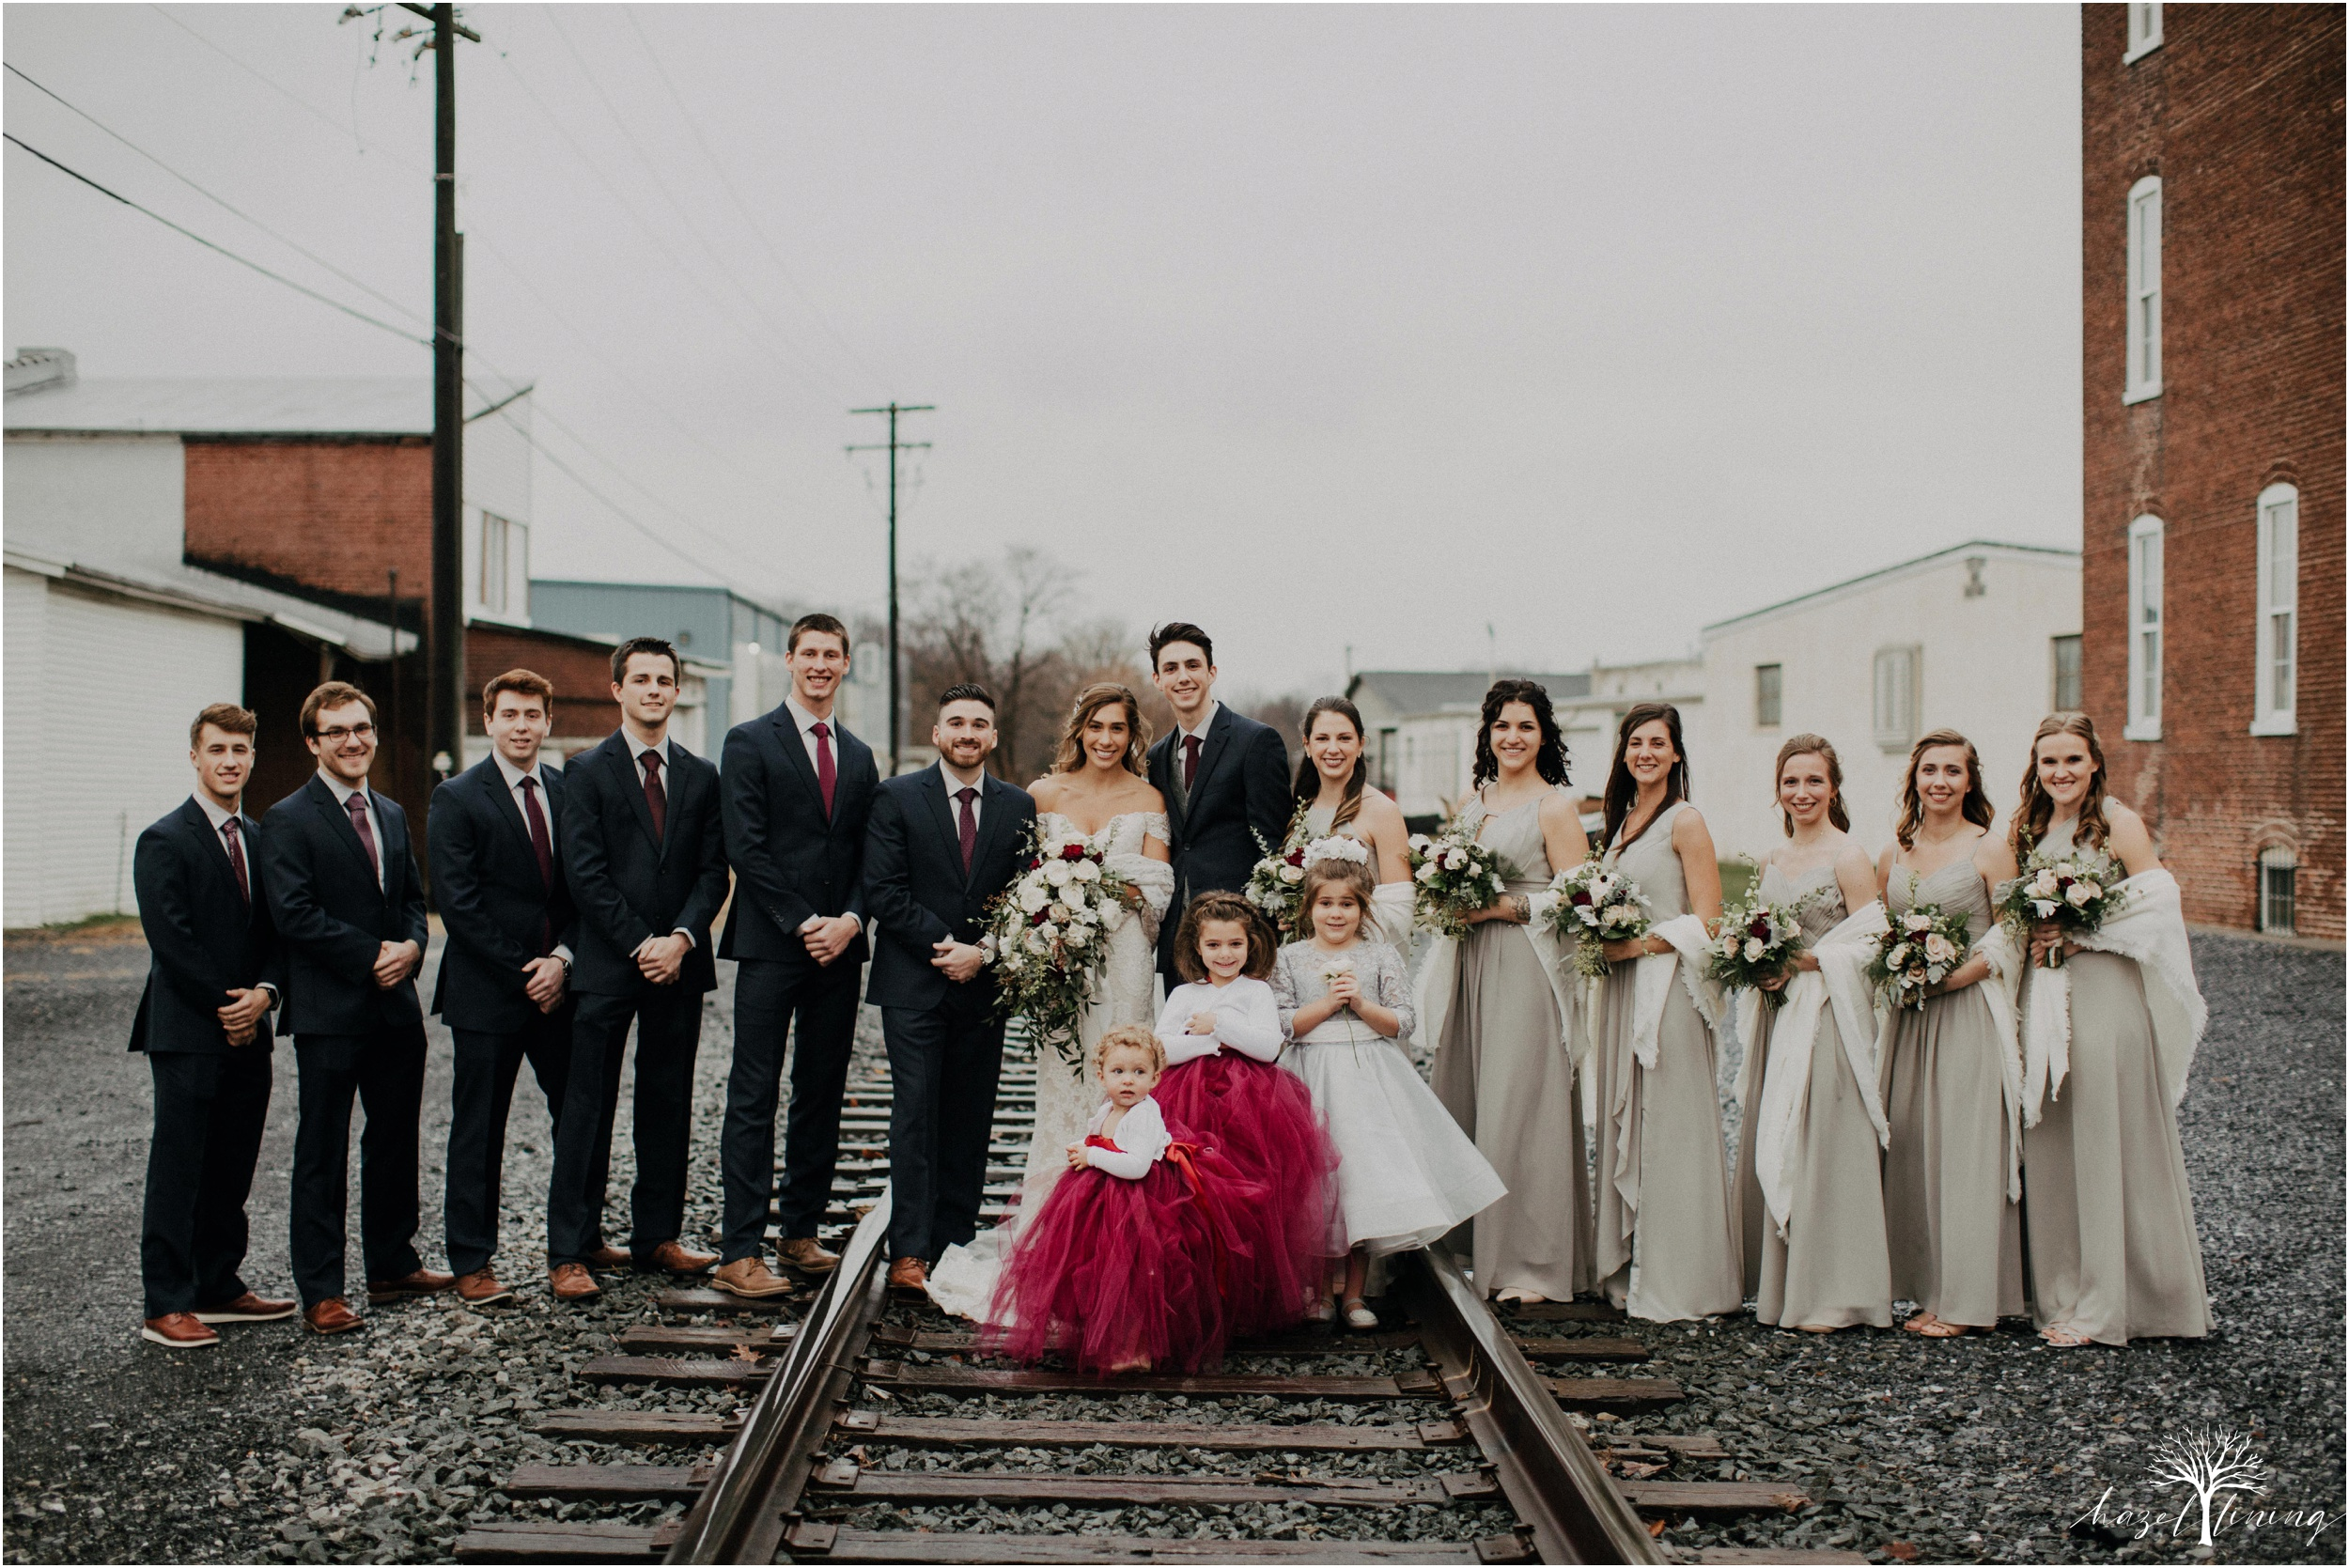 emma-matt-gehringer-the-booking-house-lancaster-manhiem-pennsylvania-winter-wedding_0067.jpg